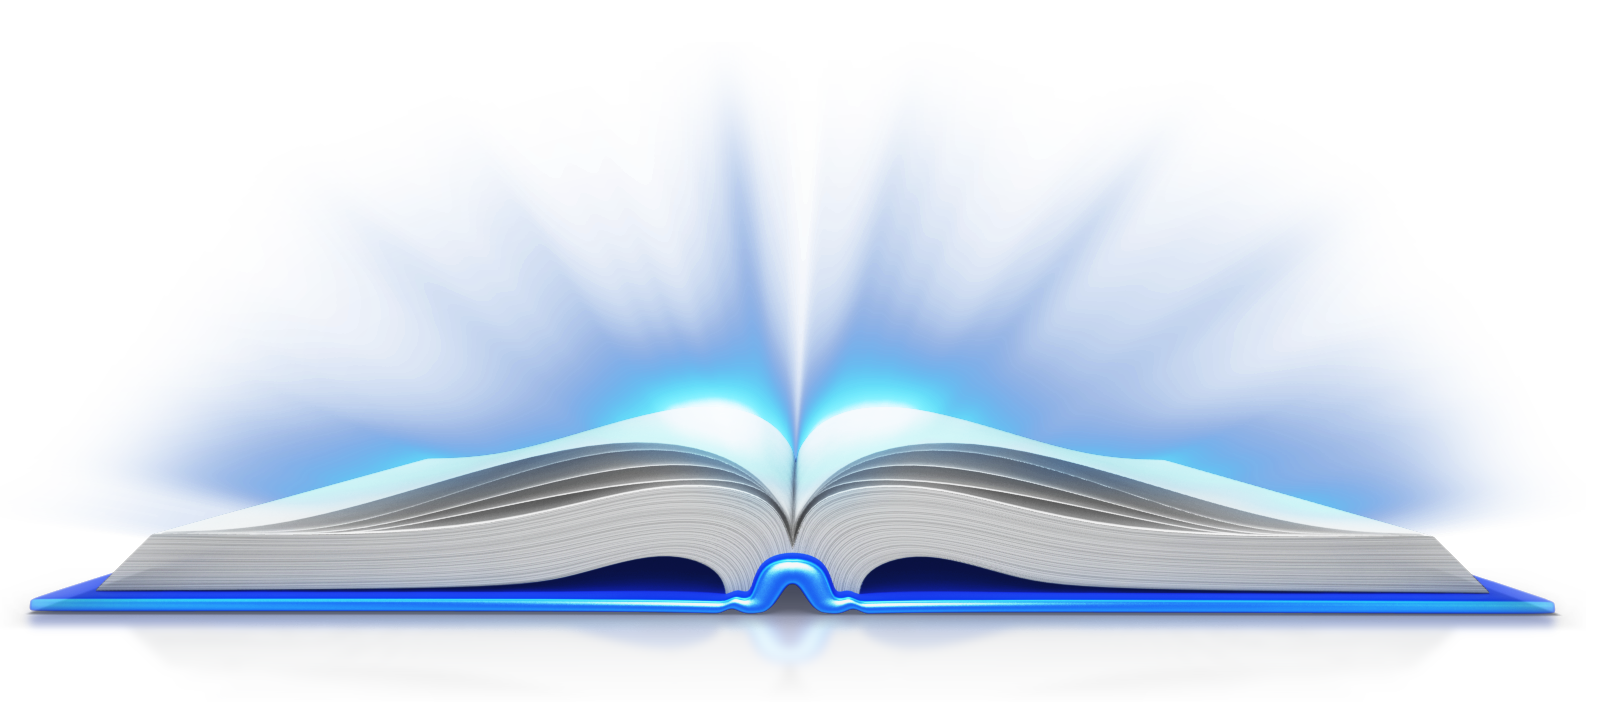 book-png-pic-1